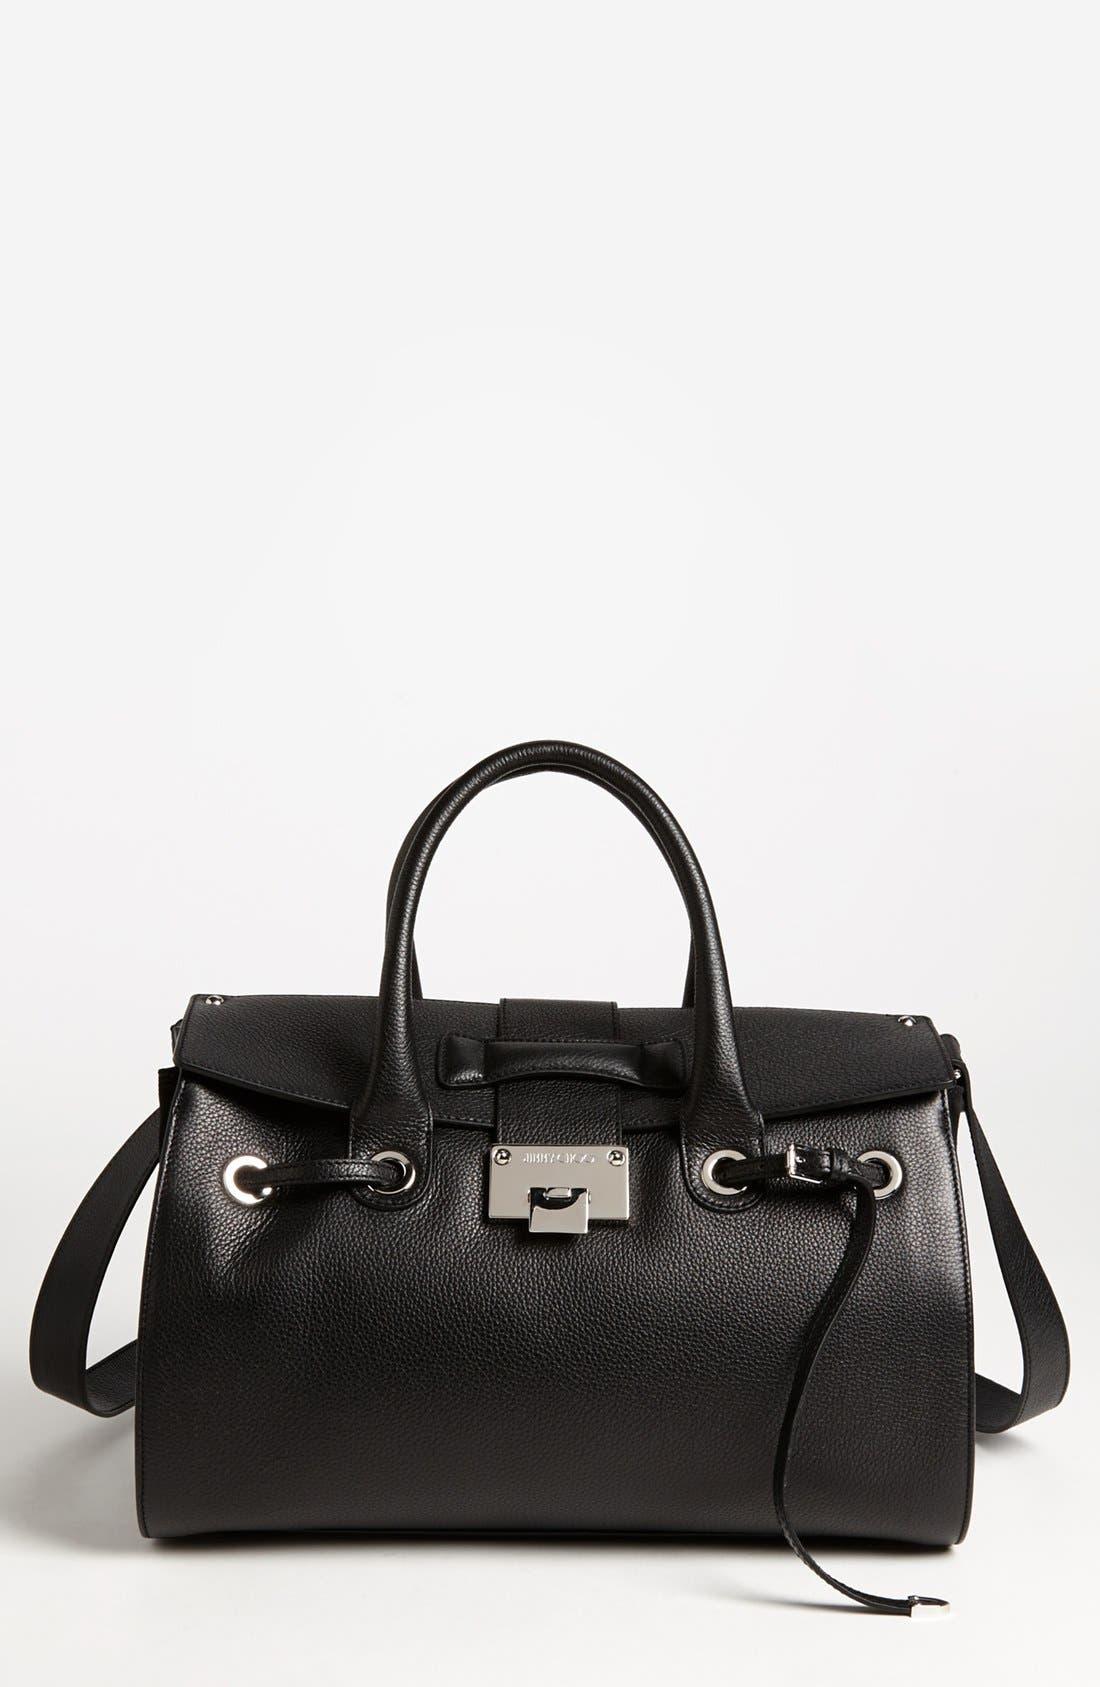 Main Image - Jimmy Choo 'Rosa' Leather Satchel